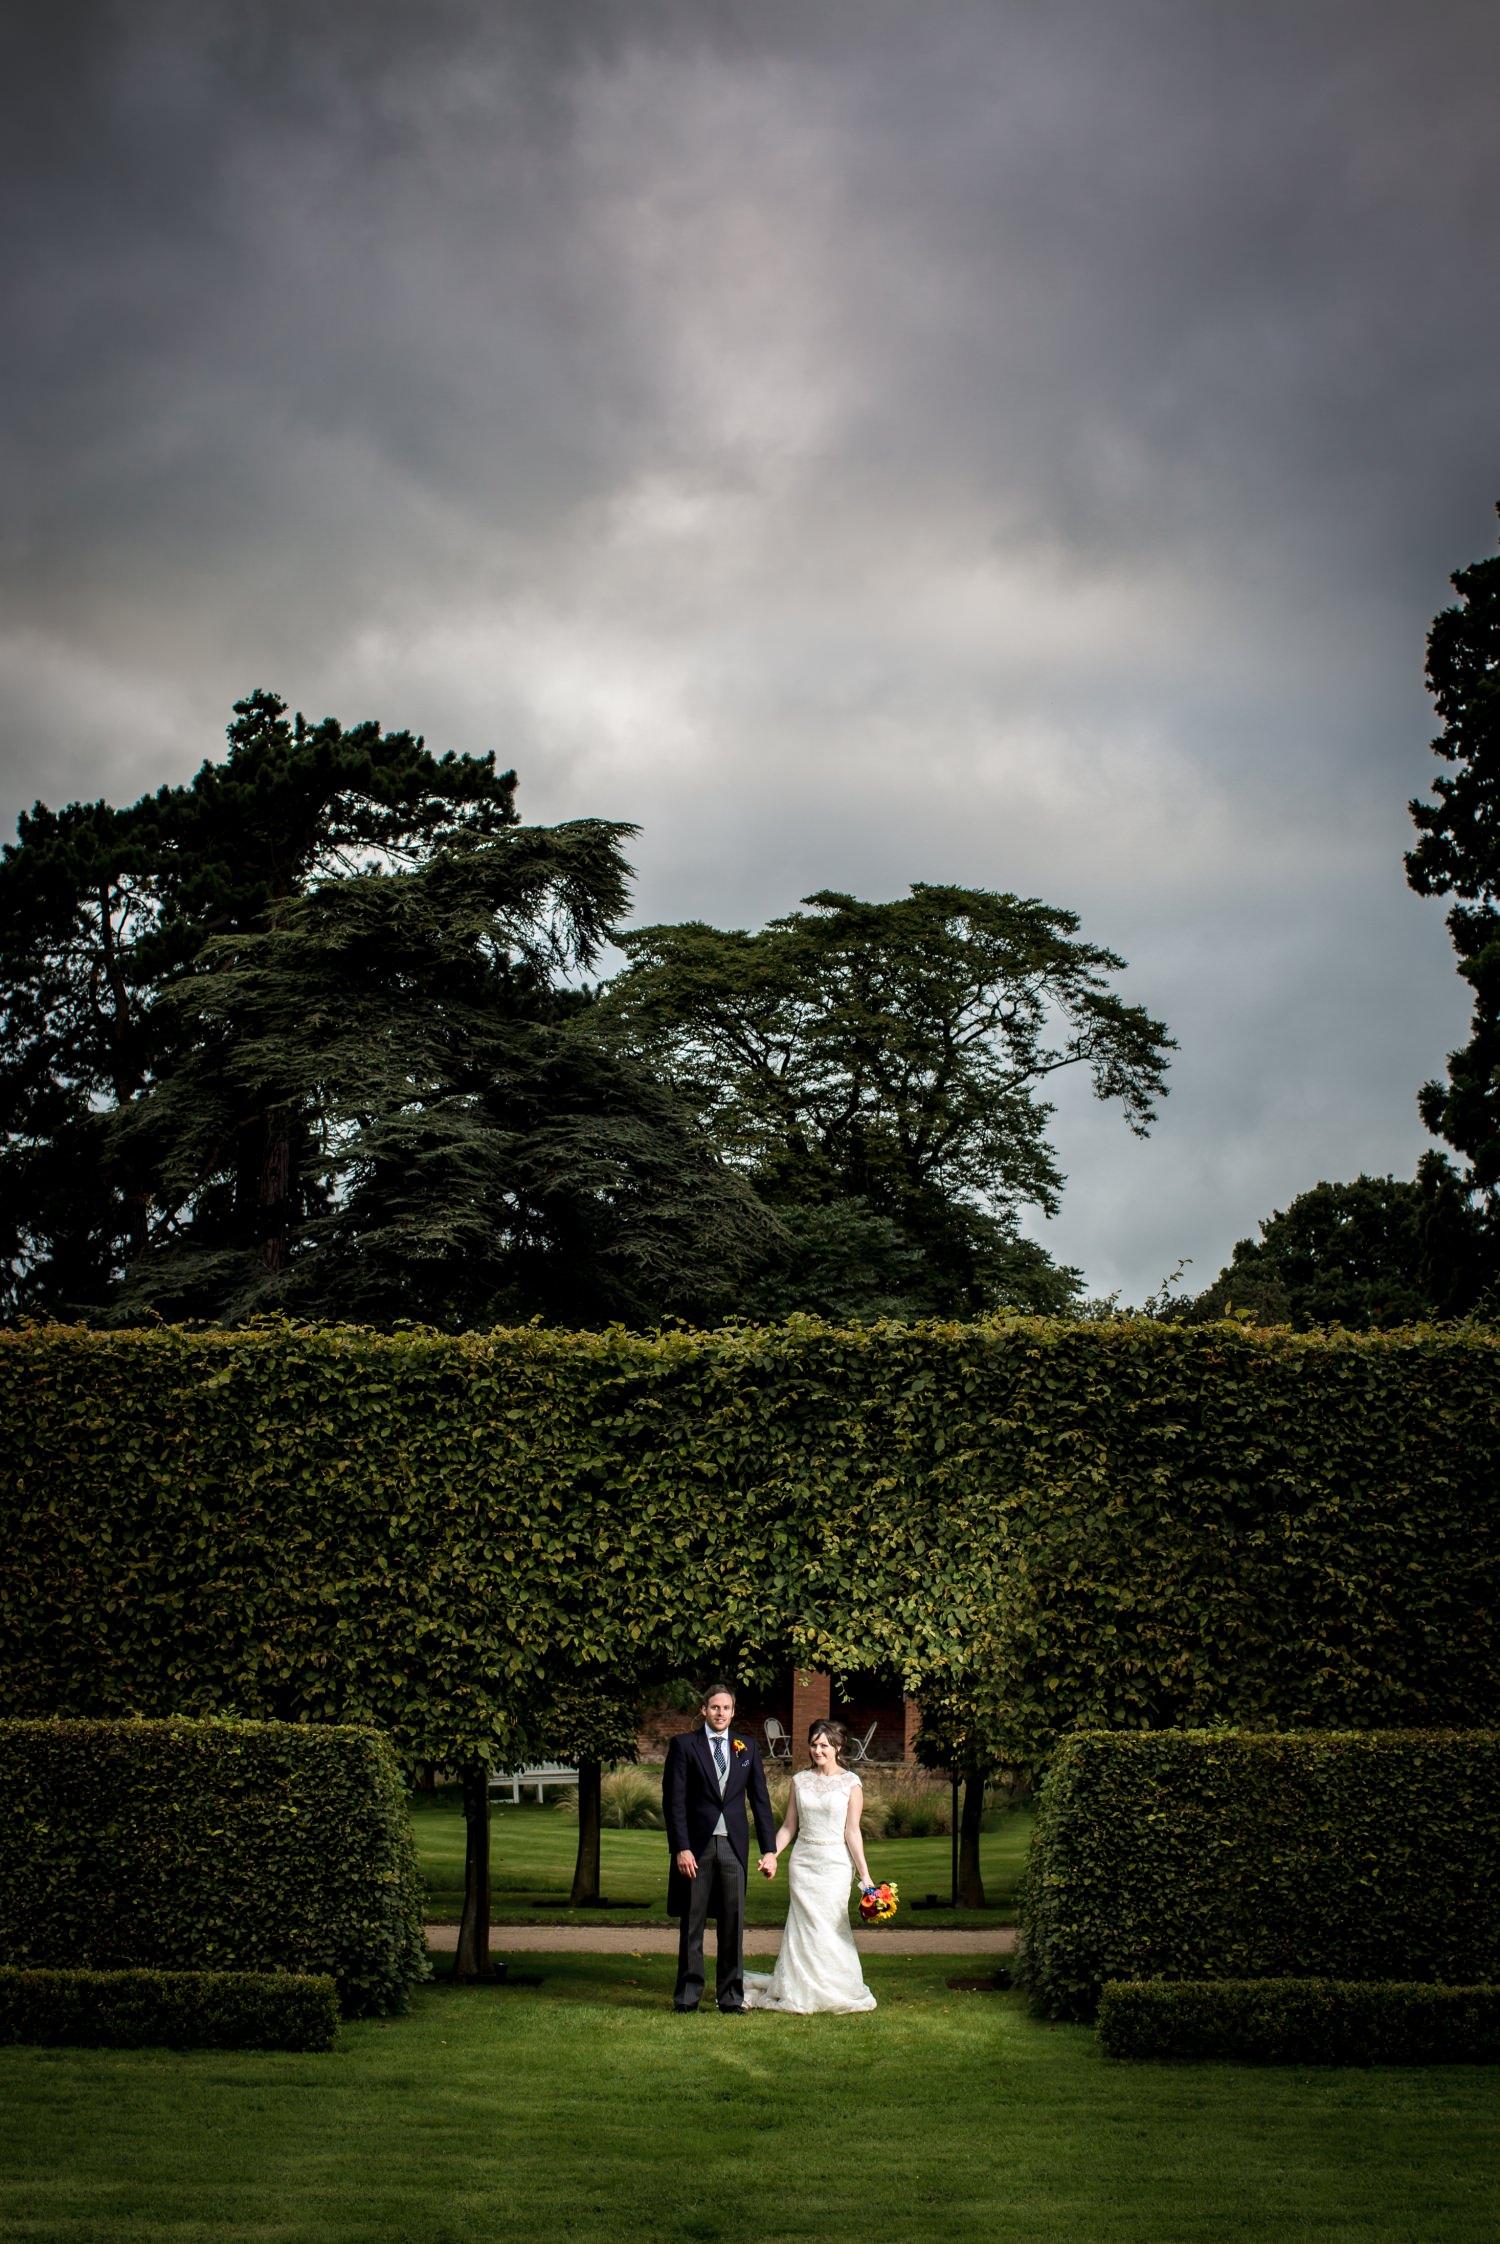 wedding portrait at Cheshire venue Combermere Abbey